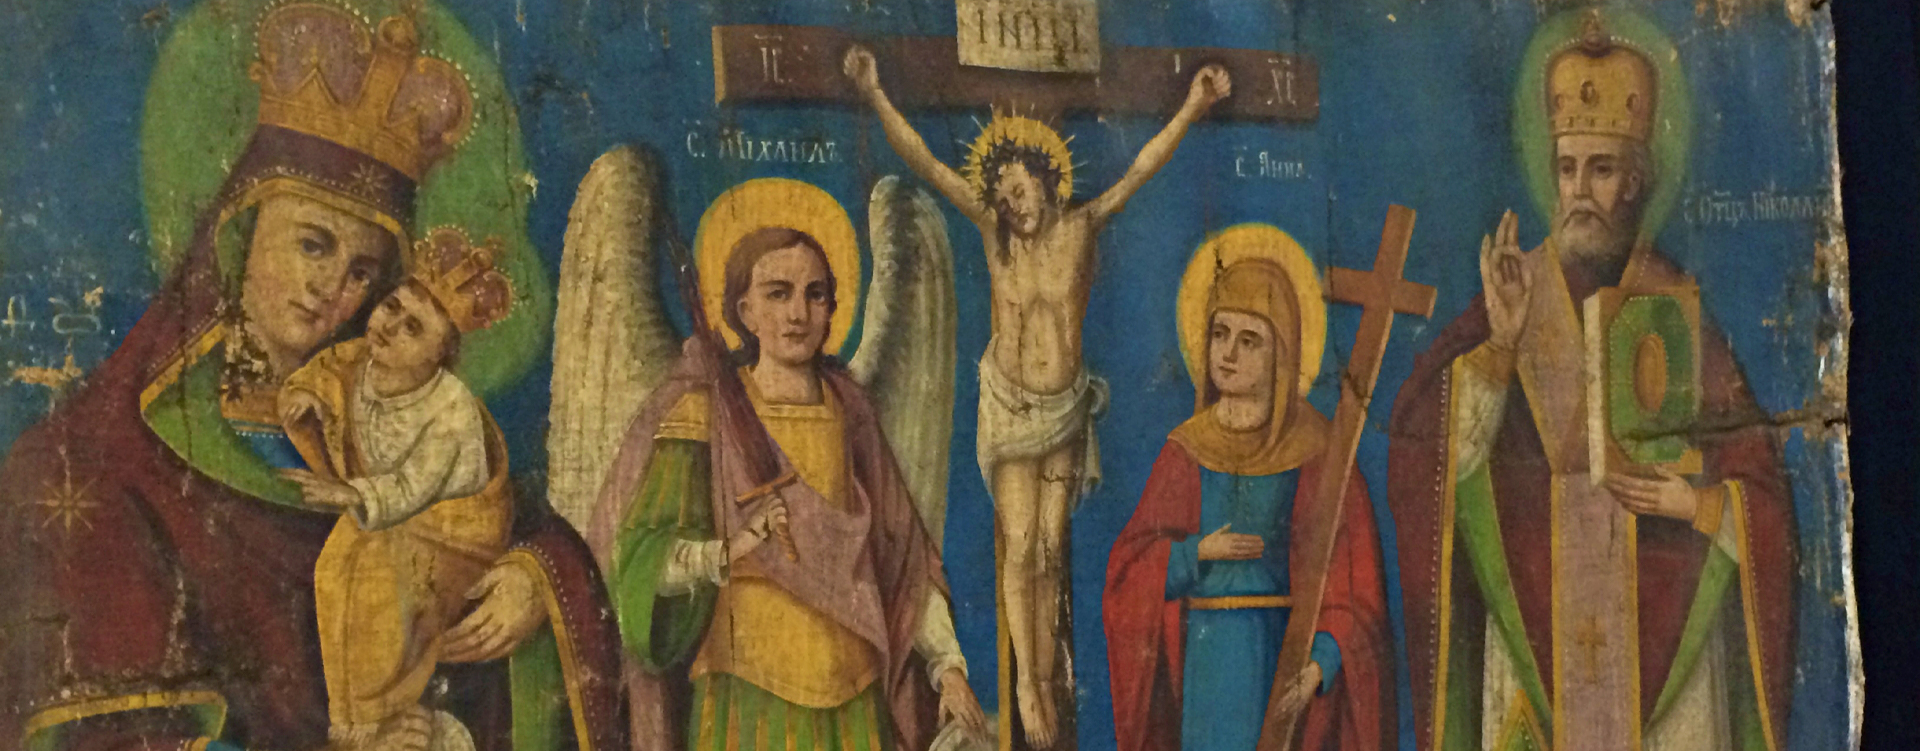 Religious Byzantine Artifacts Header Image